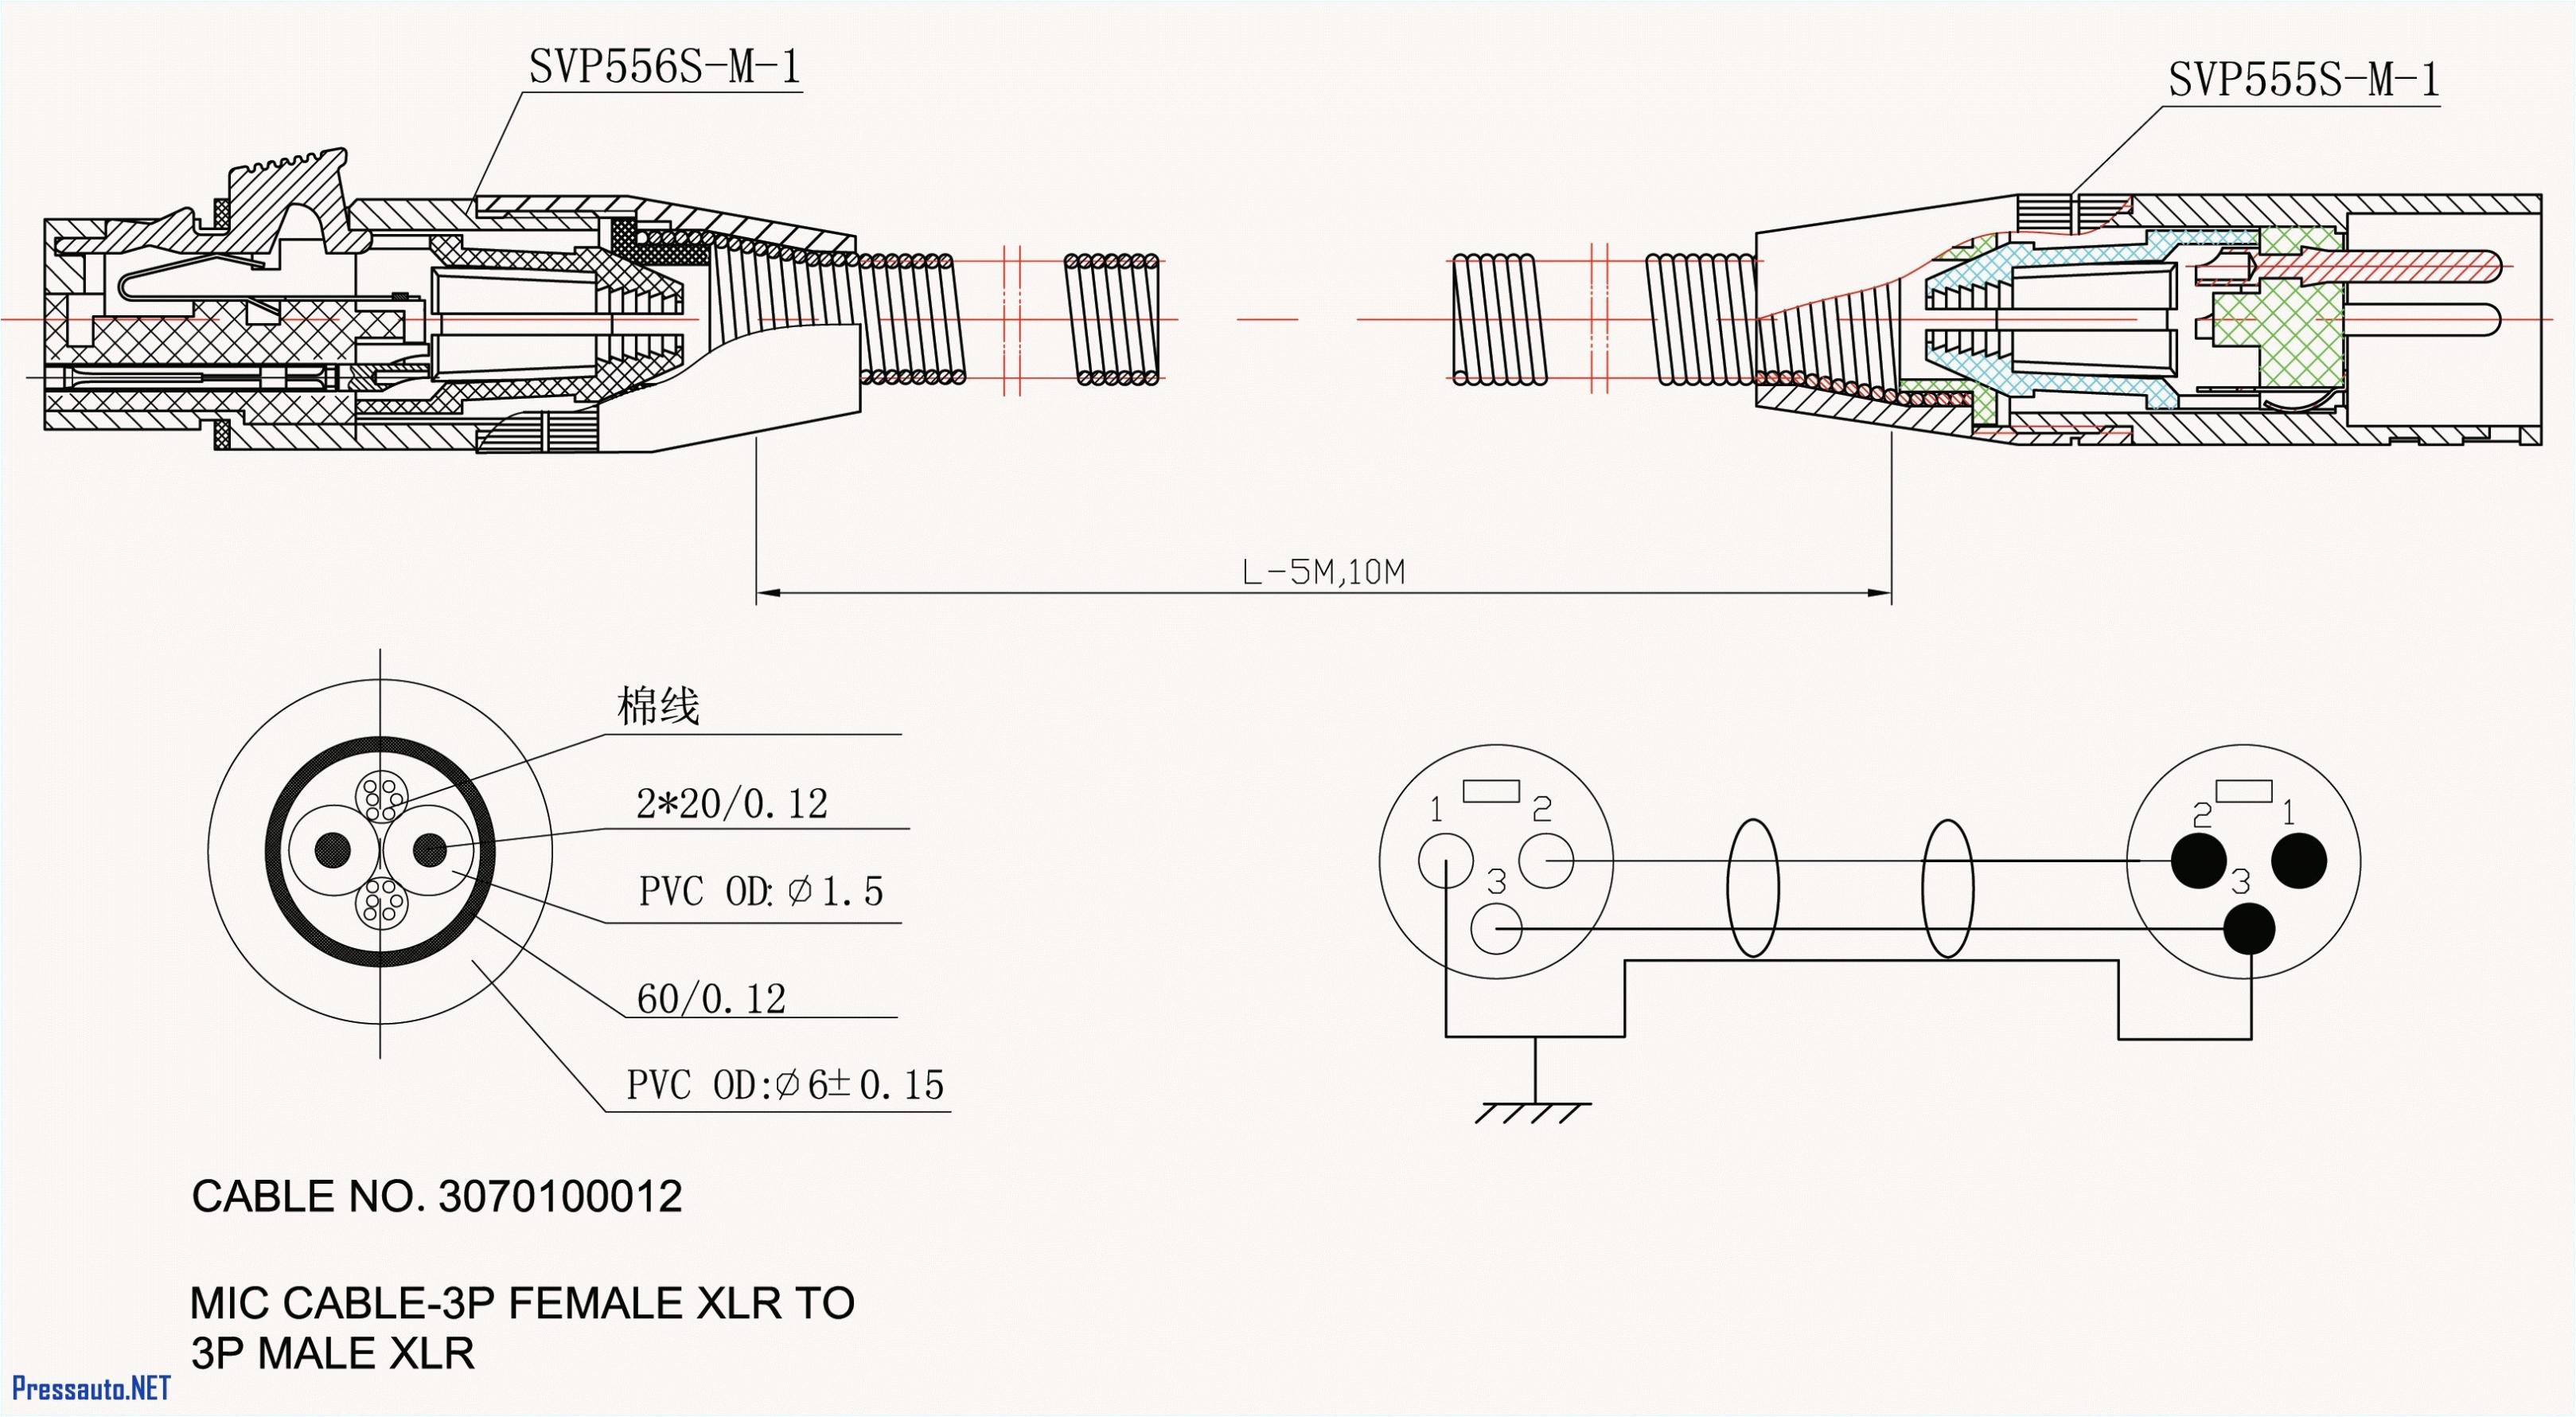 volvo penta 3 0 gl wiring diagram my wiring diagram 3 0 volvo penta wiring diagram